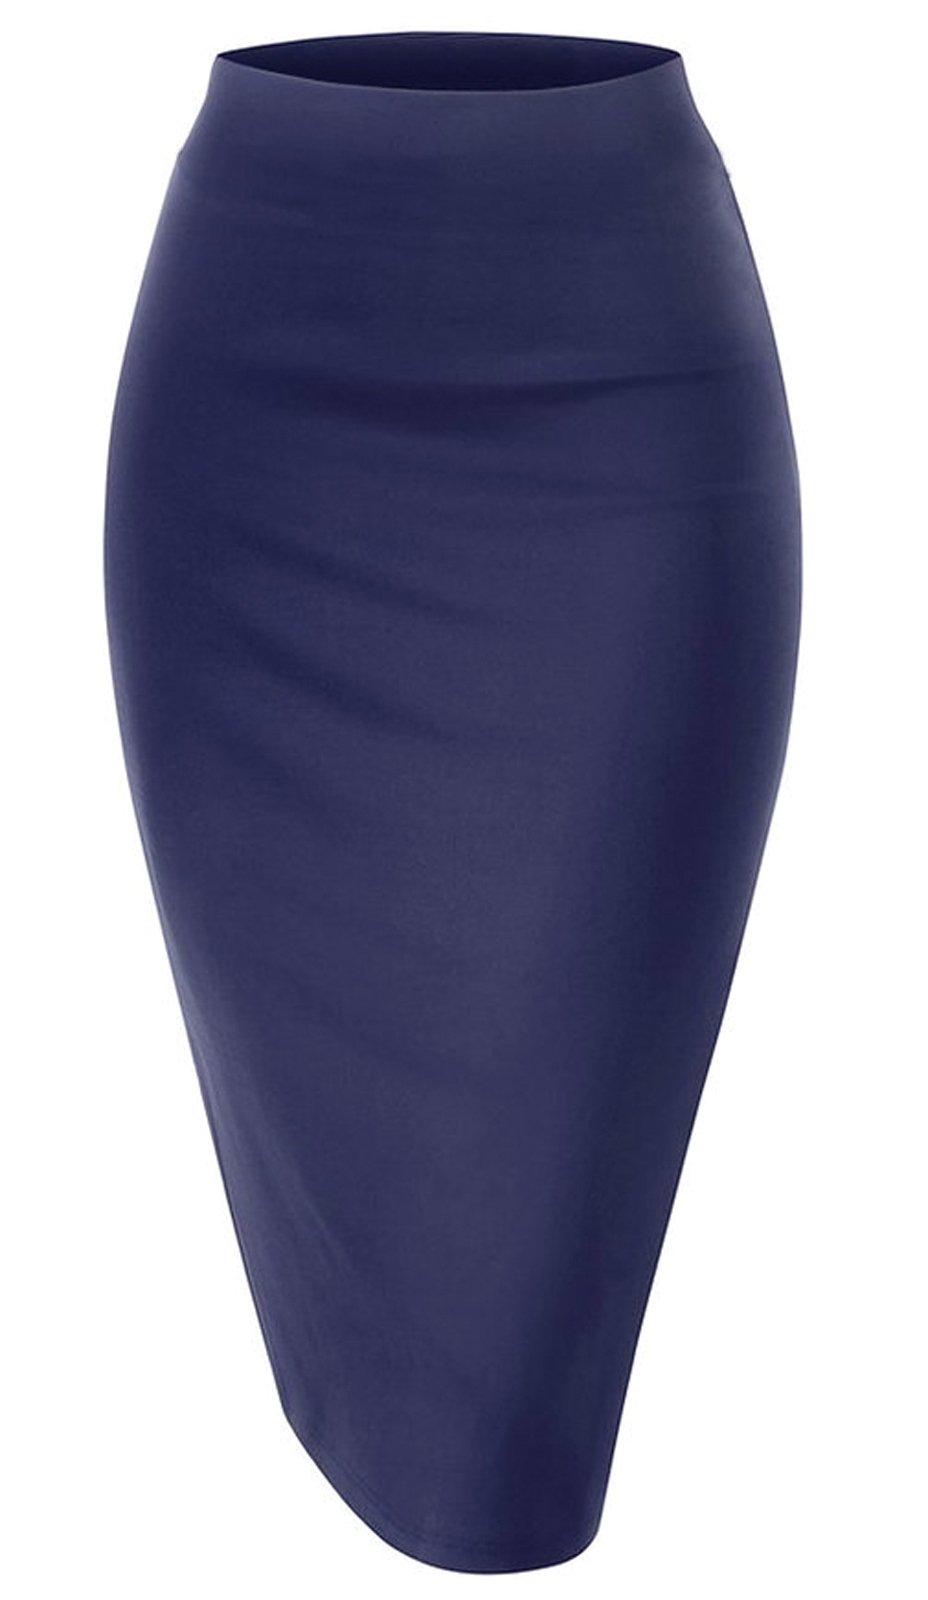 Women Elastic Waist Band Stretchy Fabric Pencil Skirt (Medium, Navy) by Noble U